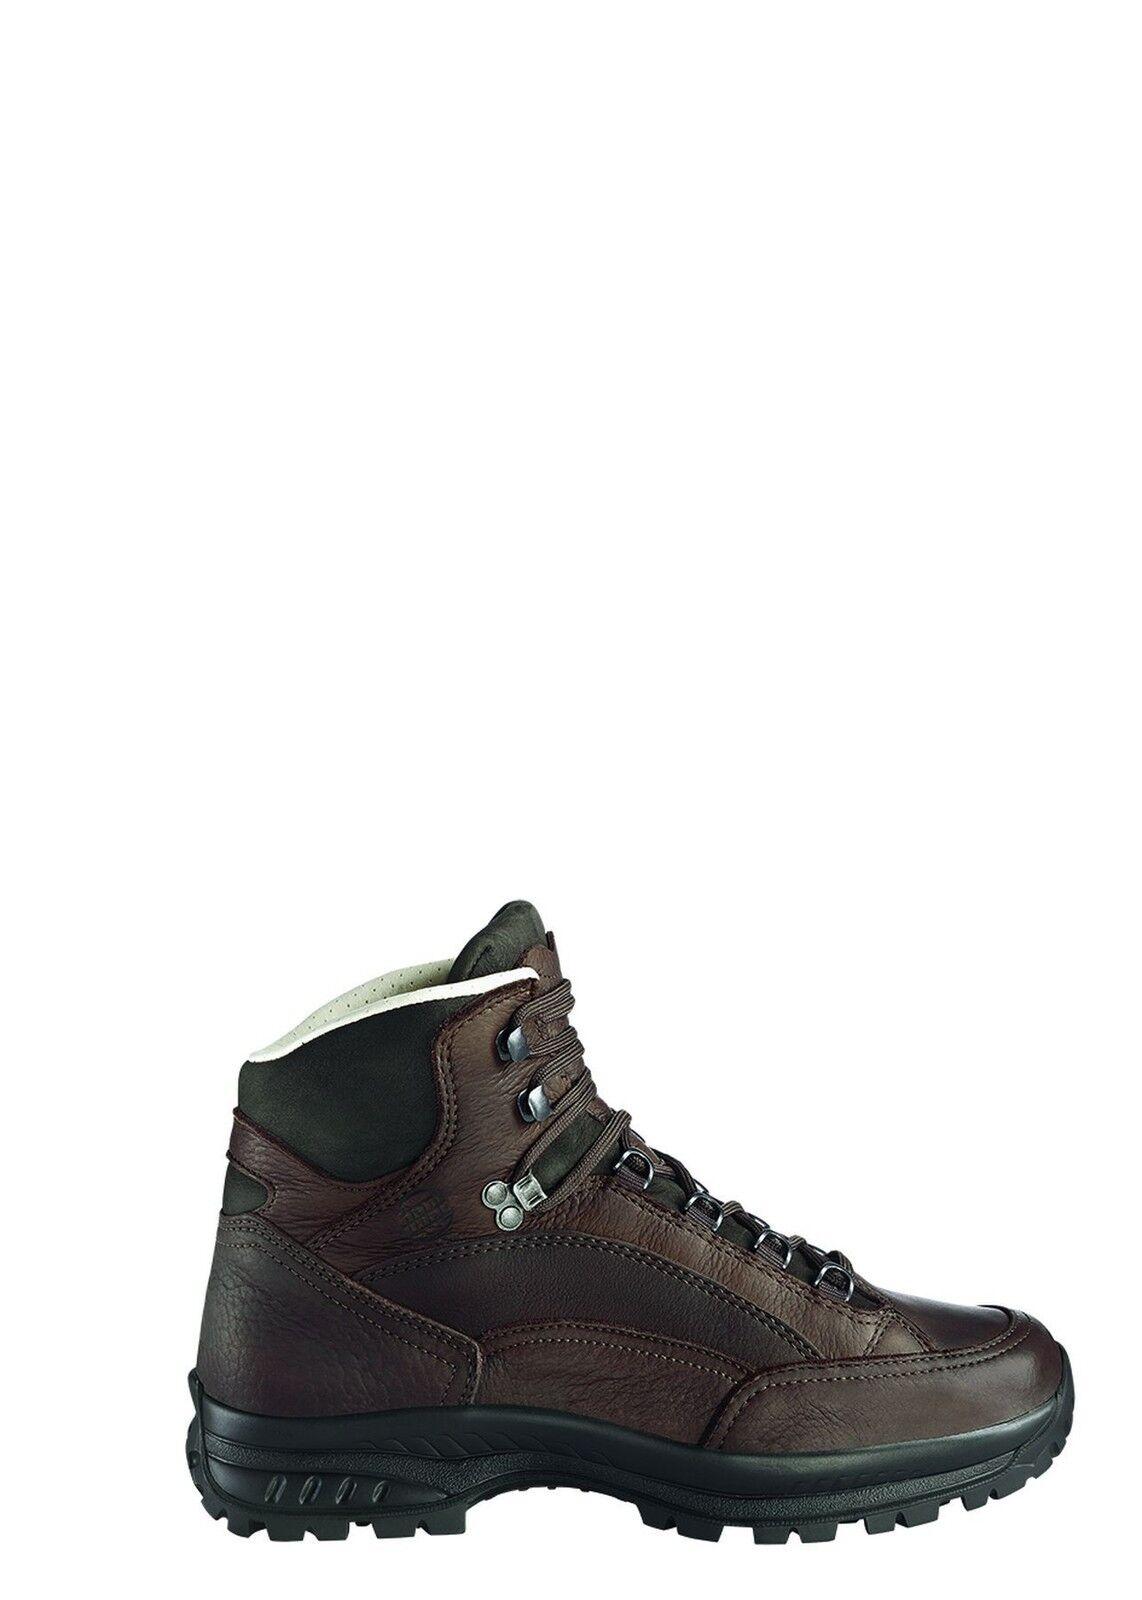 Hanwag Senderismo Yak Zapatos Tingri Talla 8-42 Castaño